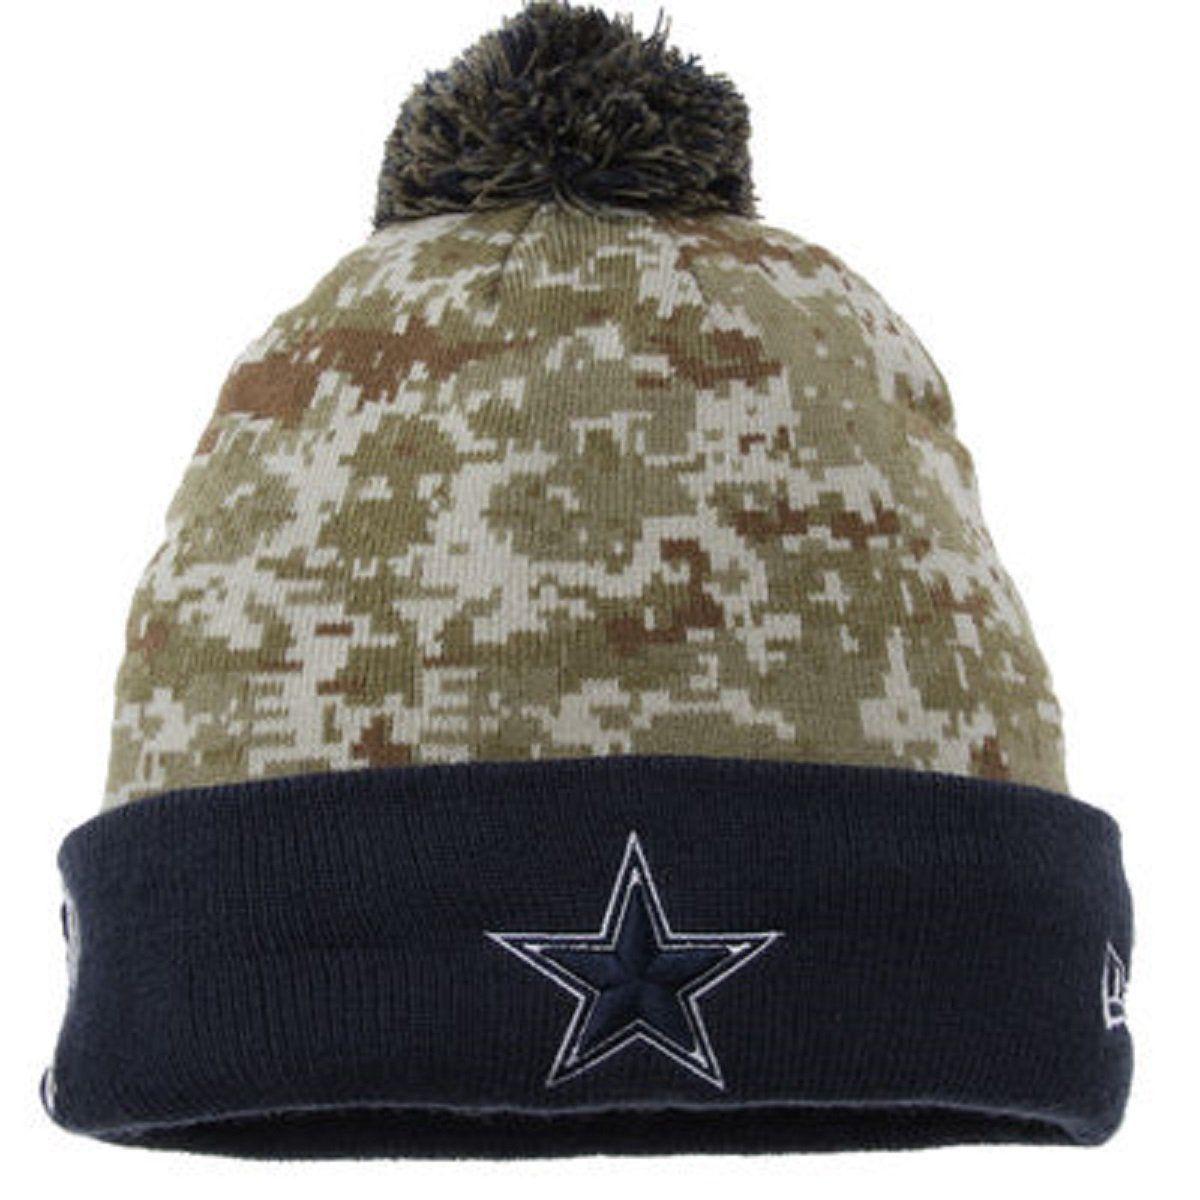 1394135cf03  25.99 Men s Dallas Cowboys NFL New Era STS Sport knit Pom Hat Digi Size  One Size